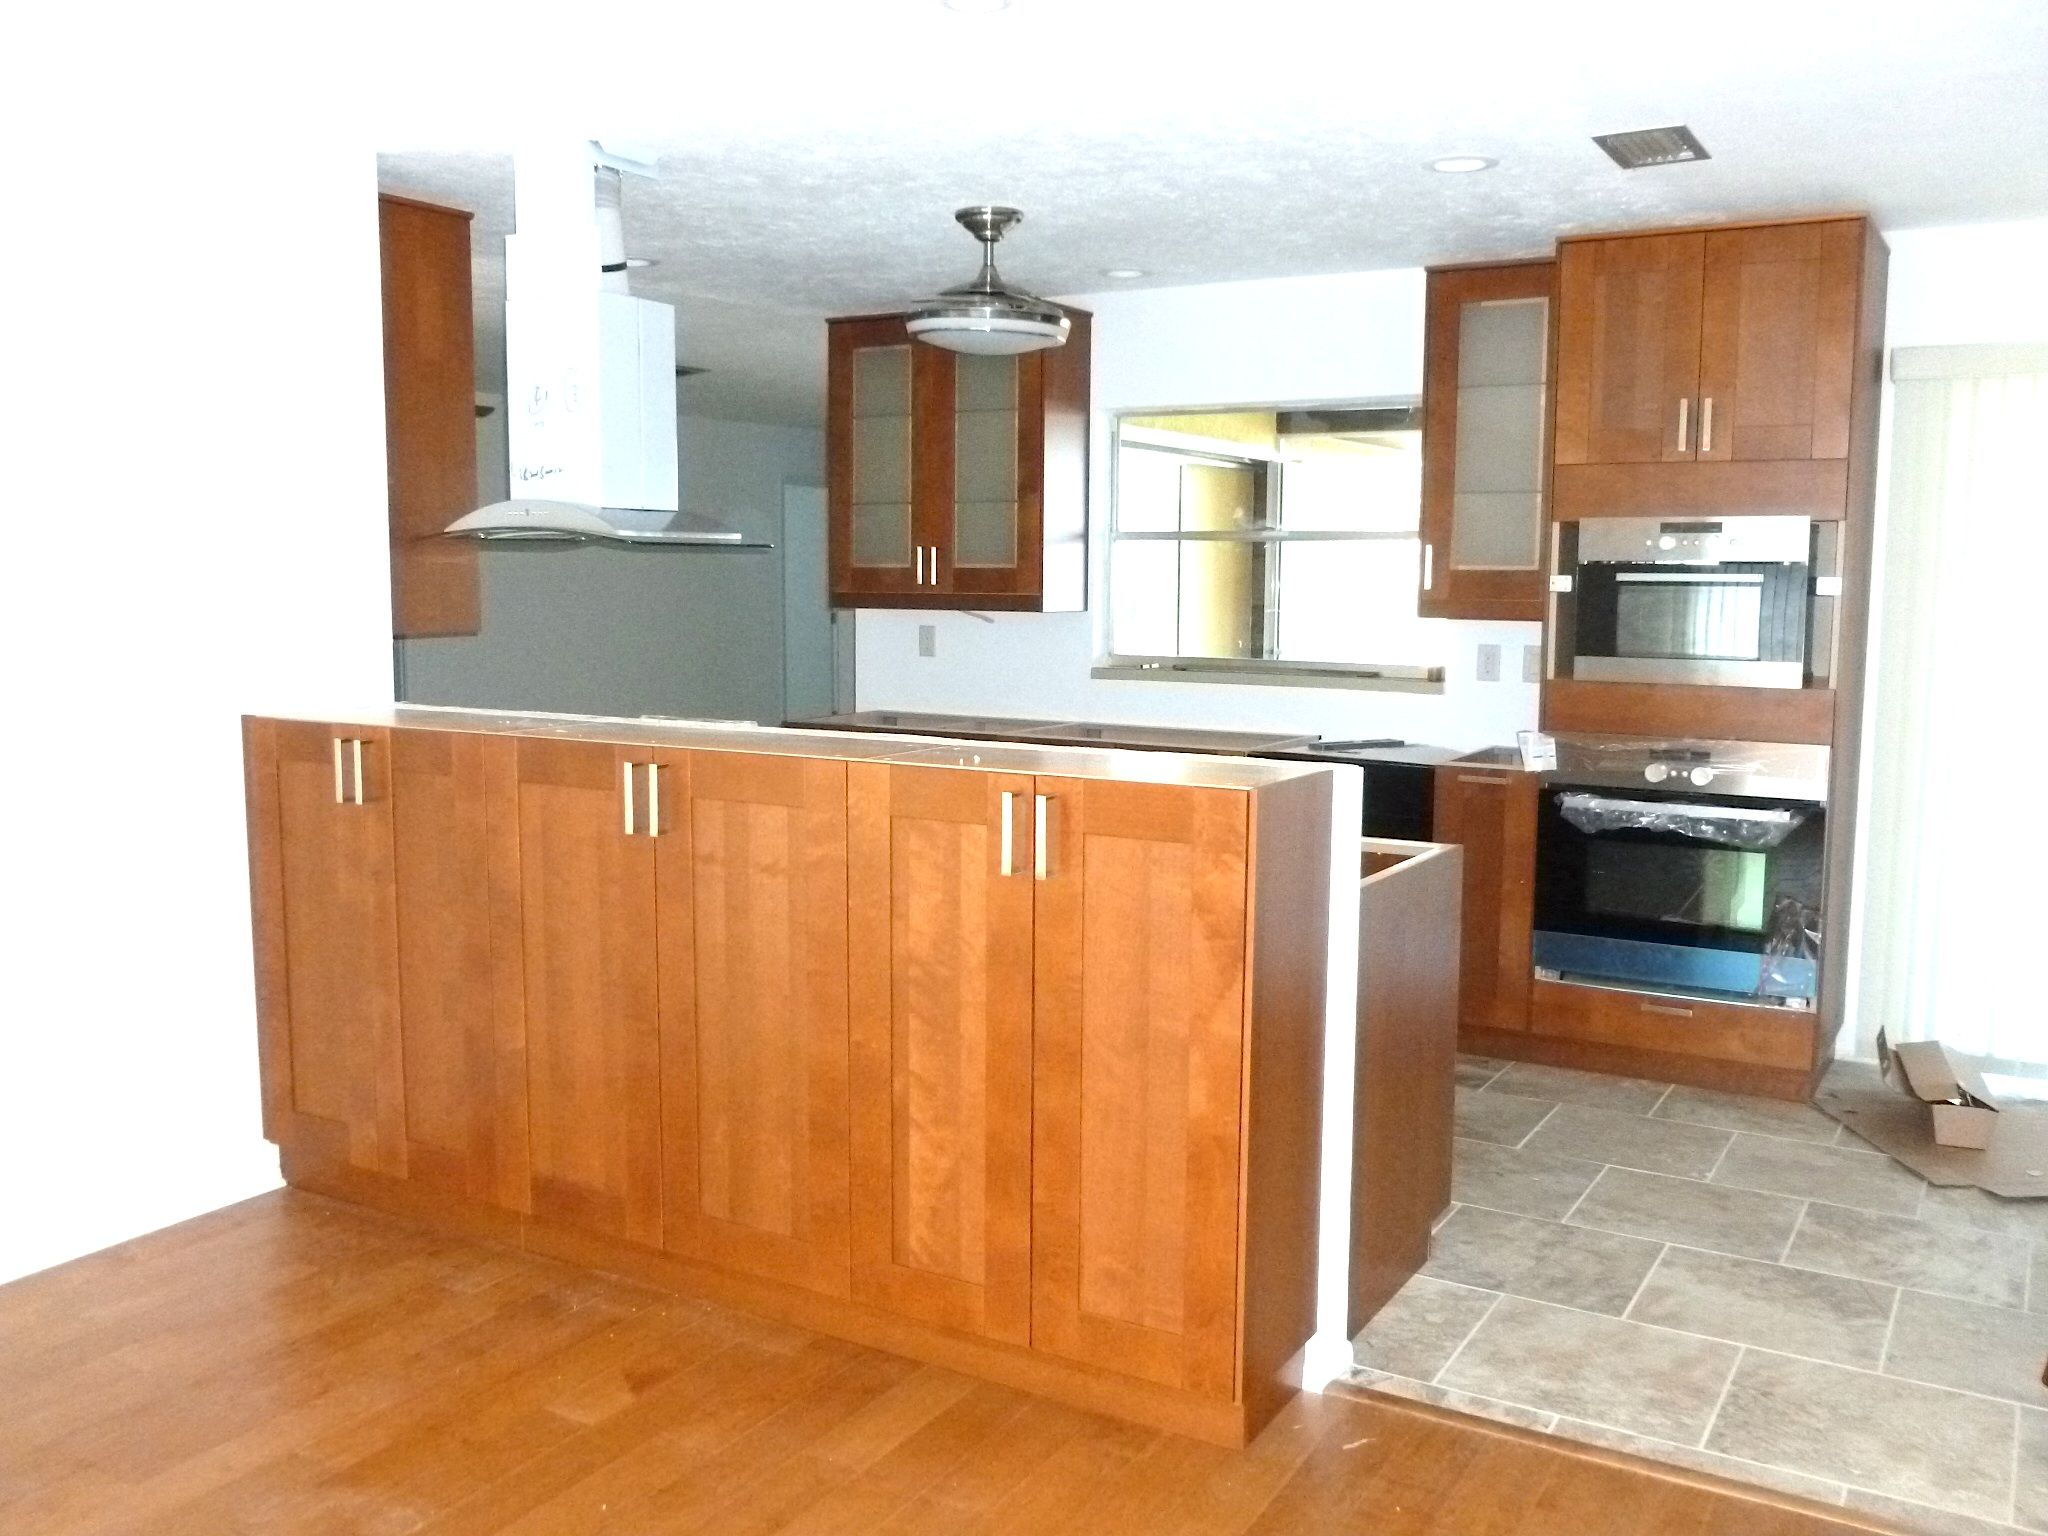 ikea cabinets | ikea kitchen installers venice florida 275x150 ikea